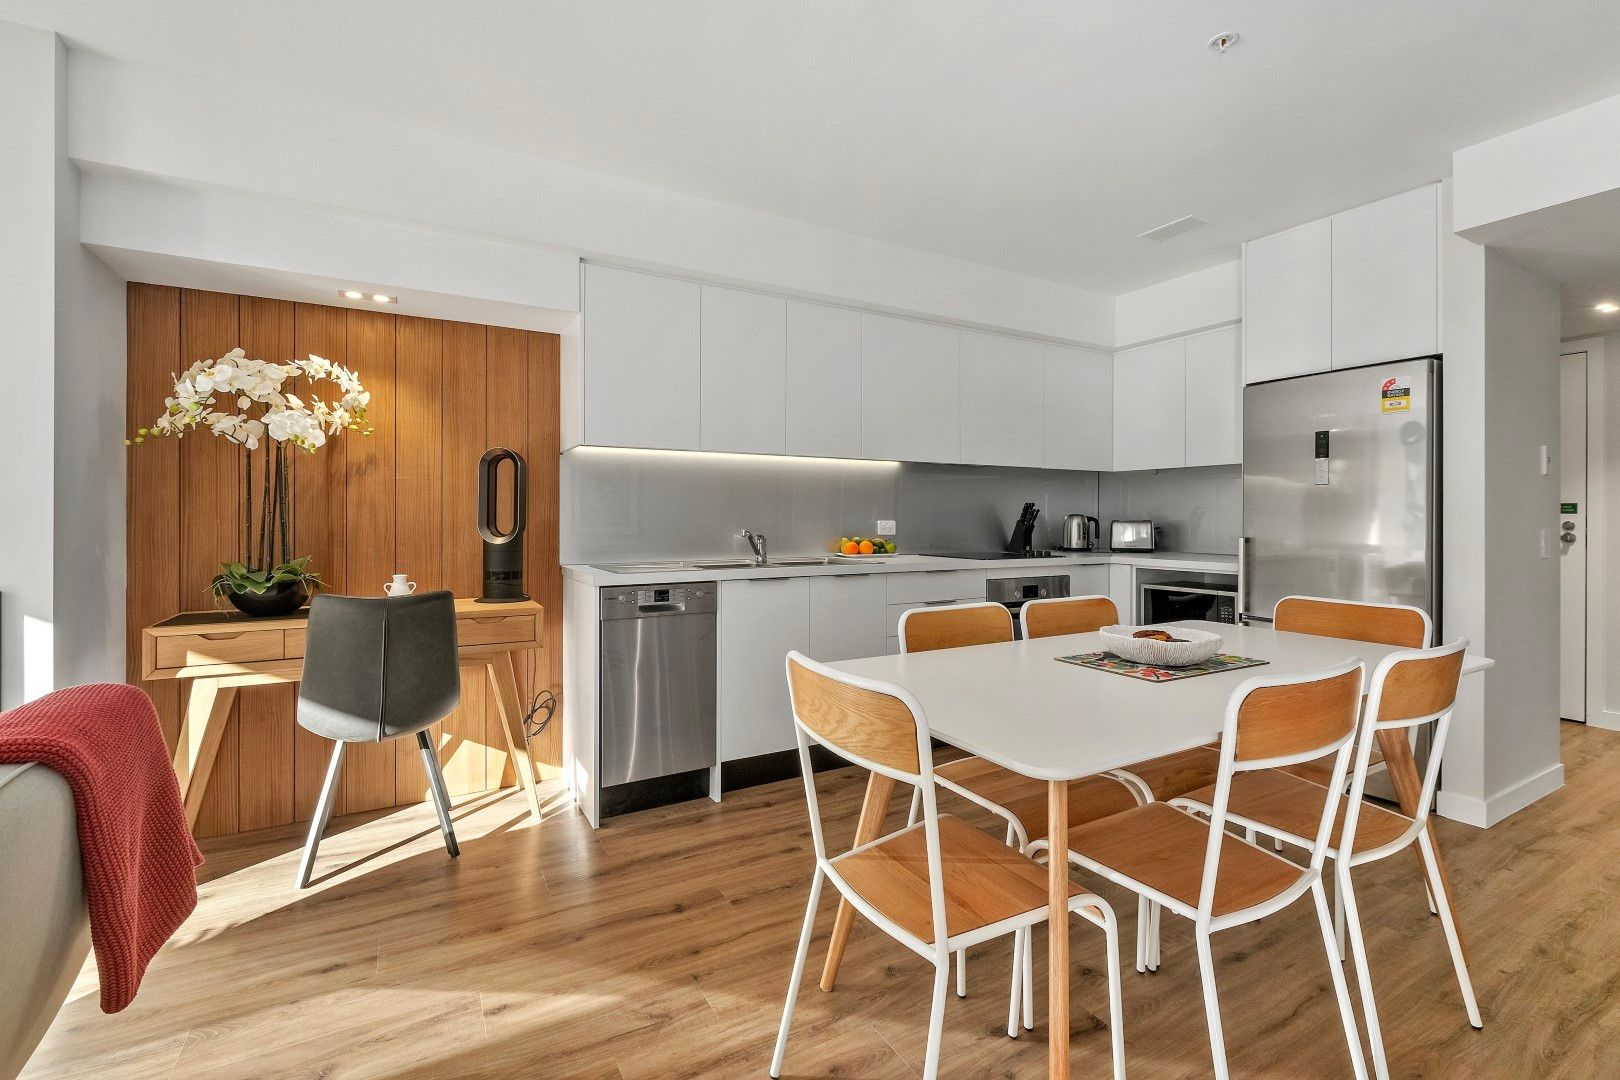 Coroshot - Apartment 7 @ Residence du Parc